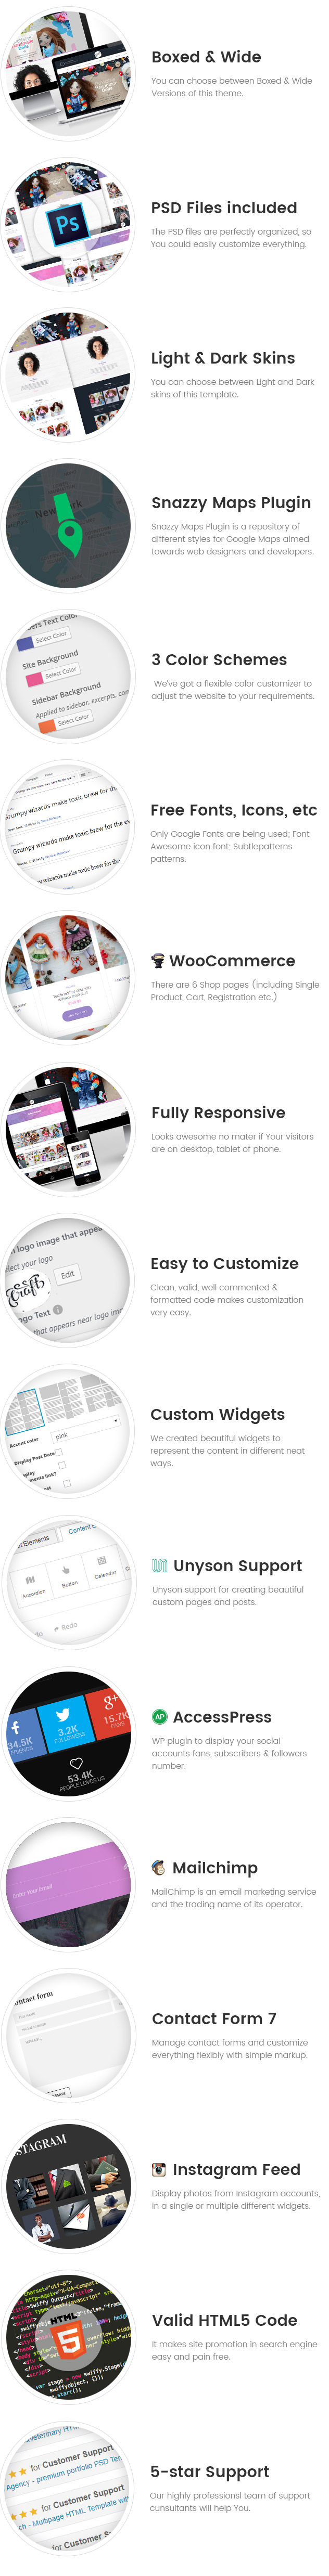 CraftPro - Hobby and Crafts WordPress Theme